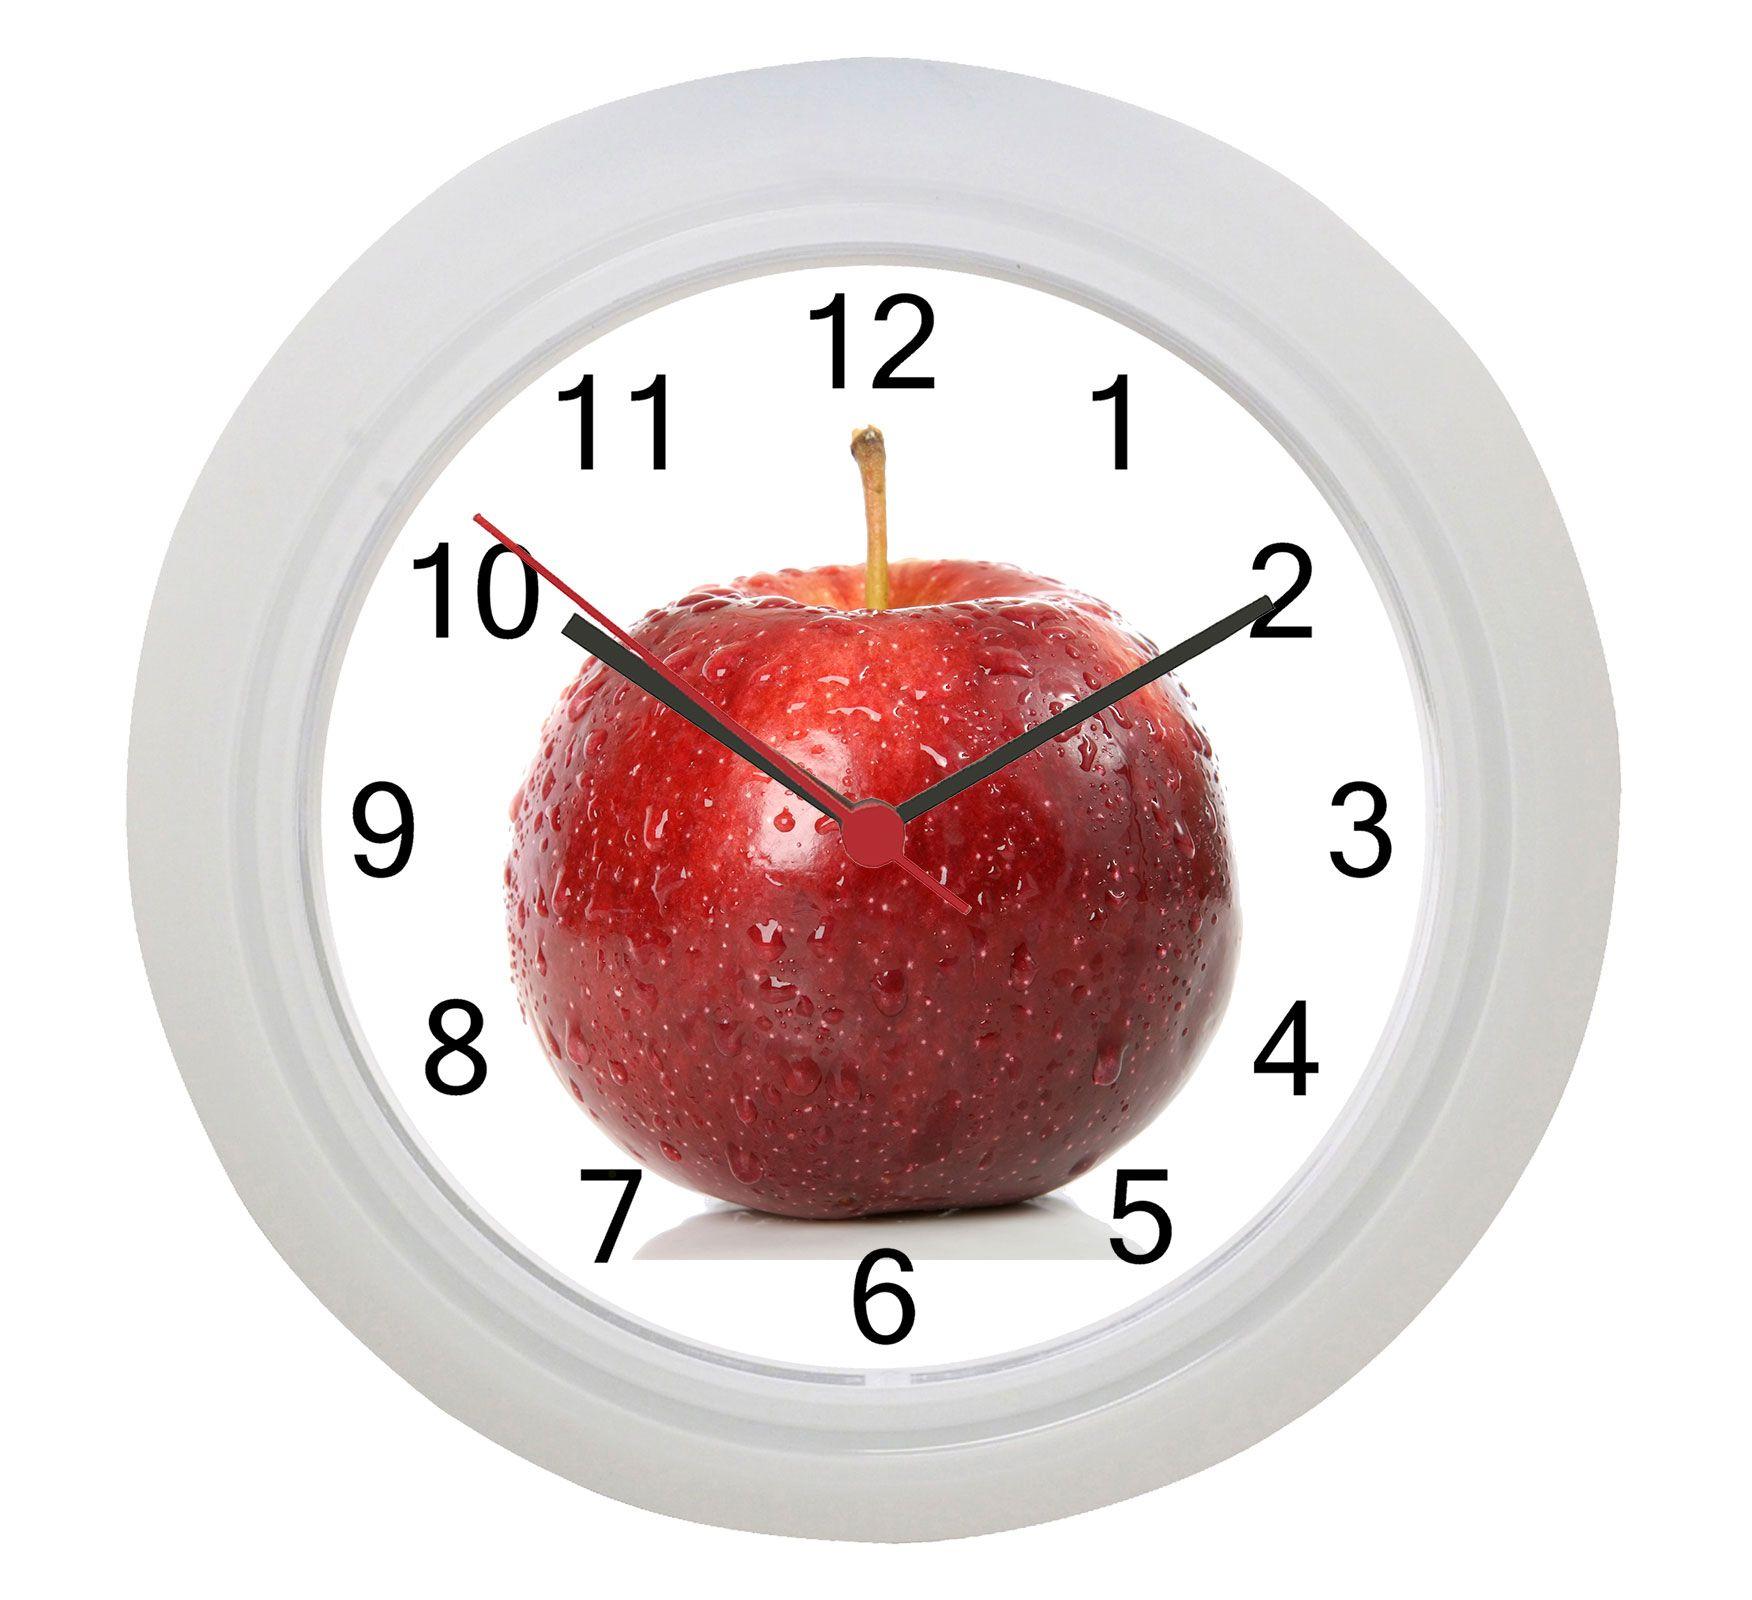 Red Apple Wall Clock Wall Clocks Clocks And White Wall Clocks